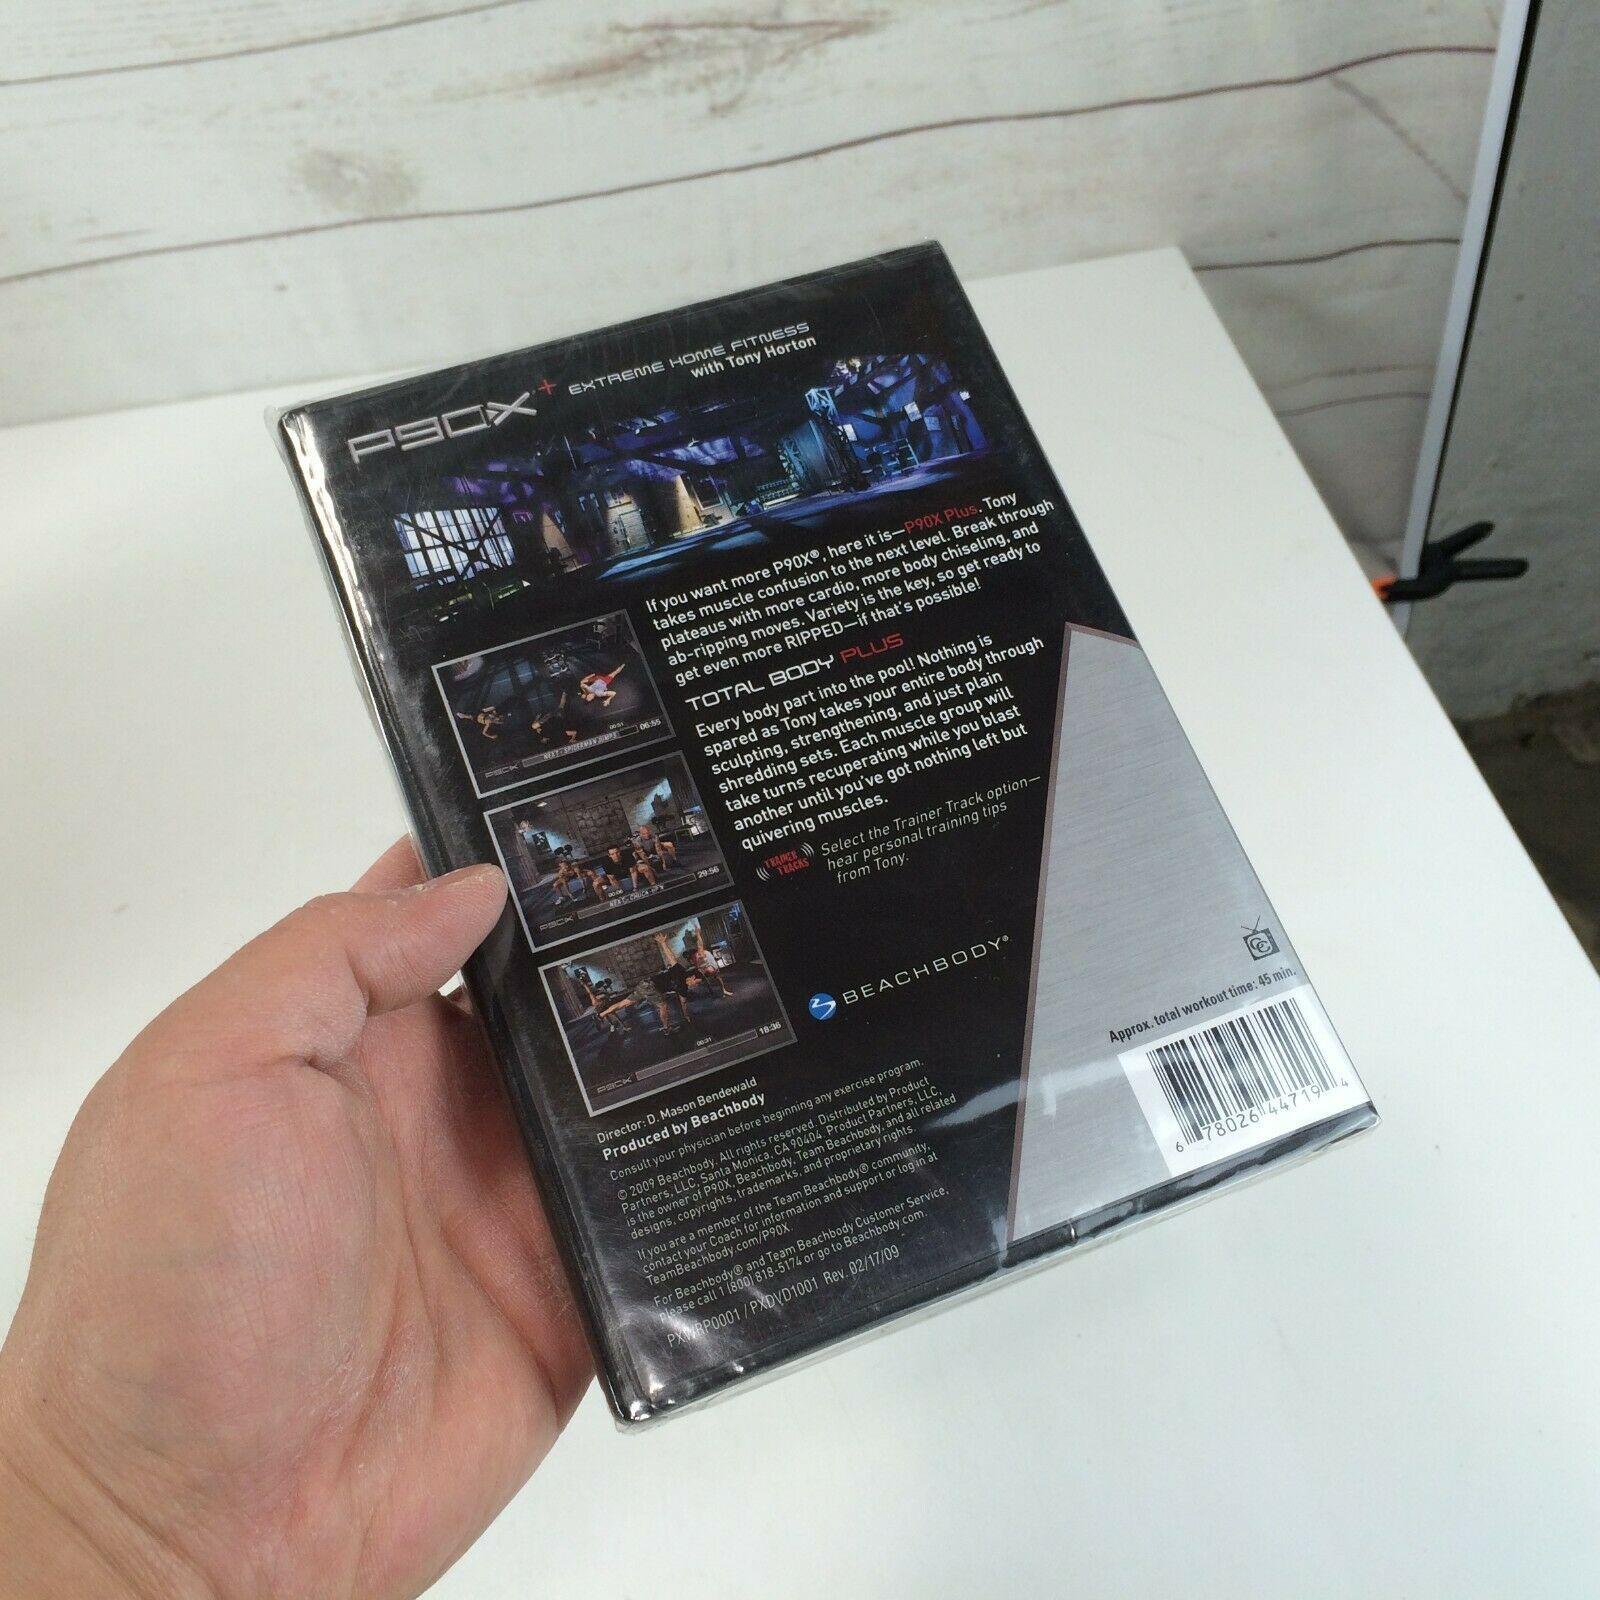 BEACHBODY P90X+ Extreme Home Fitness Total Body Plus with Tony Horton DVD NEW image 2